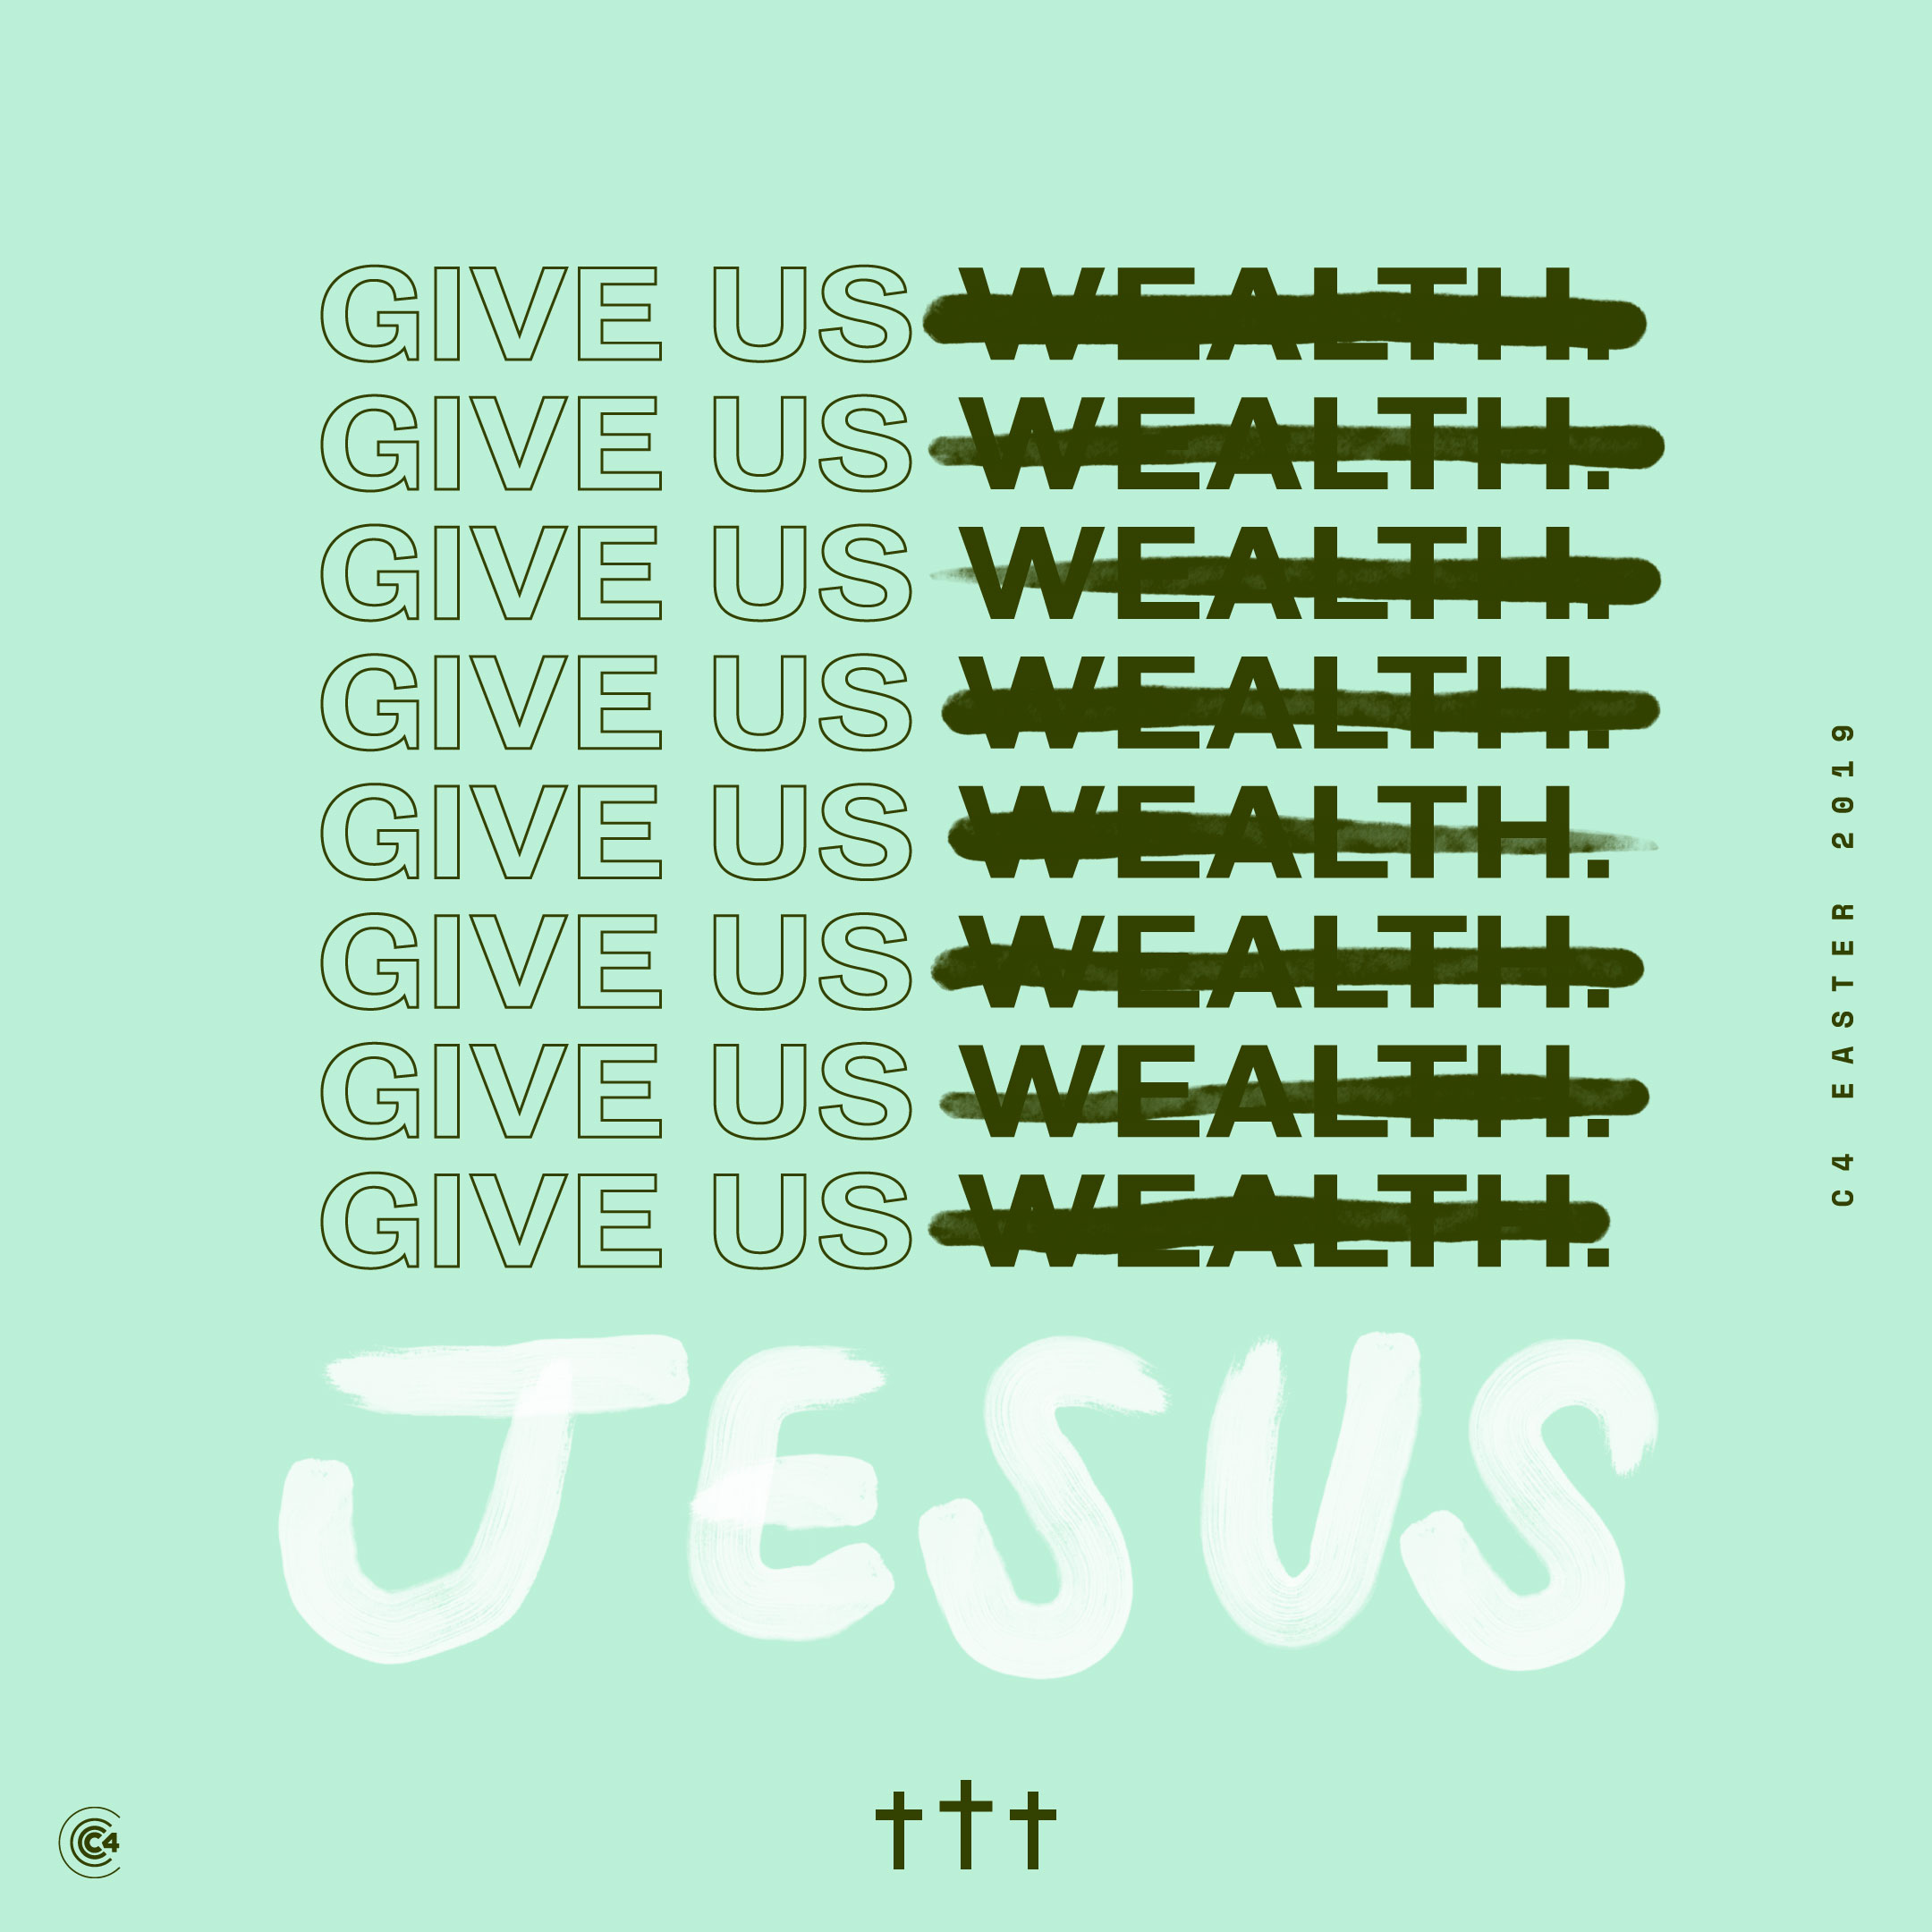 C4-Easter-Give-Us-Jesus-1.jpg